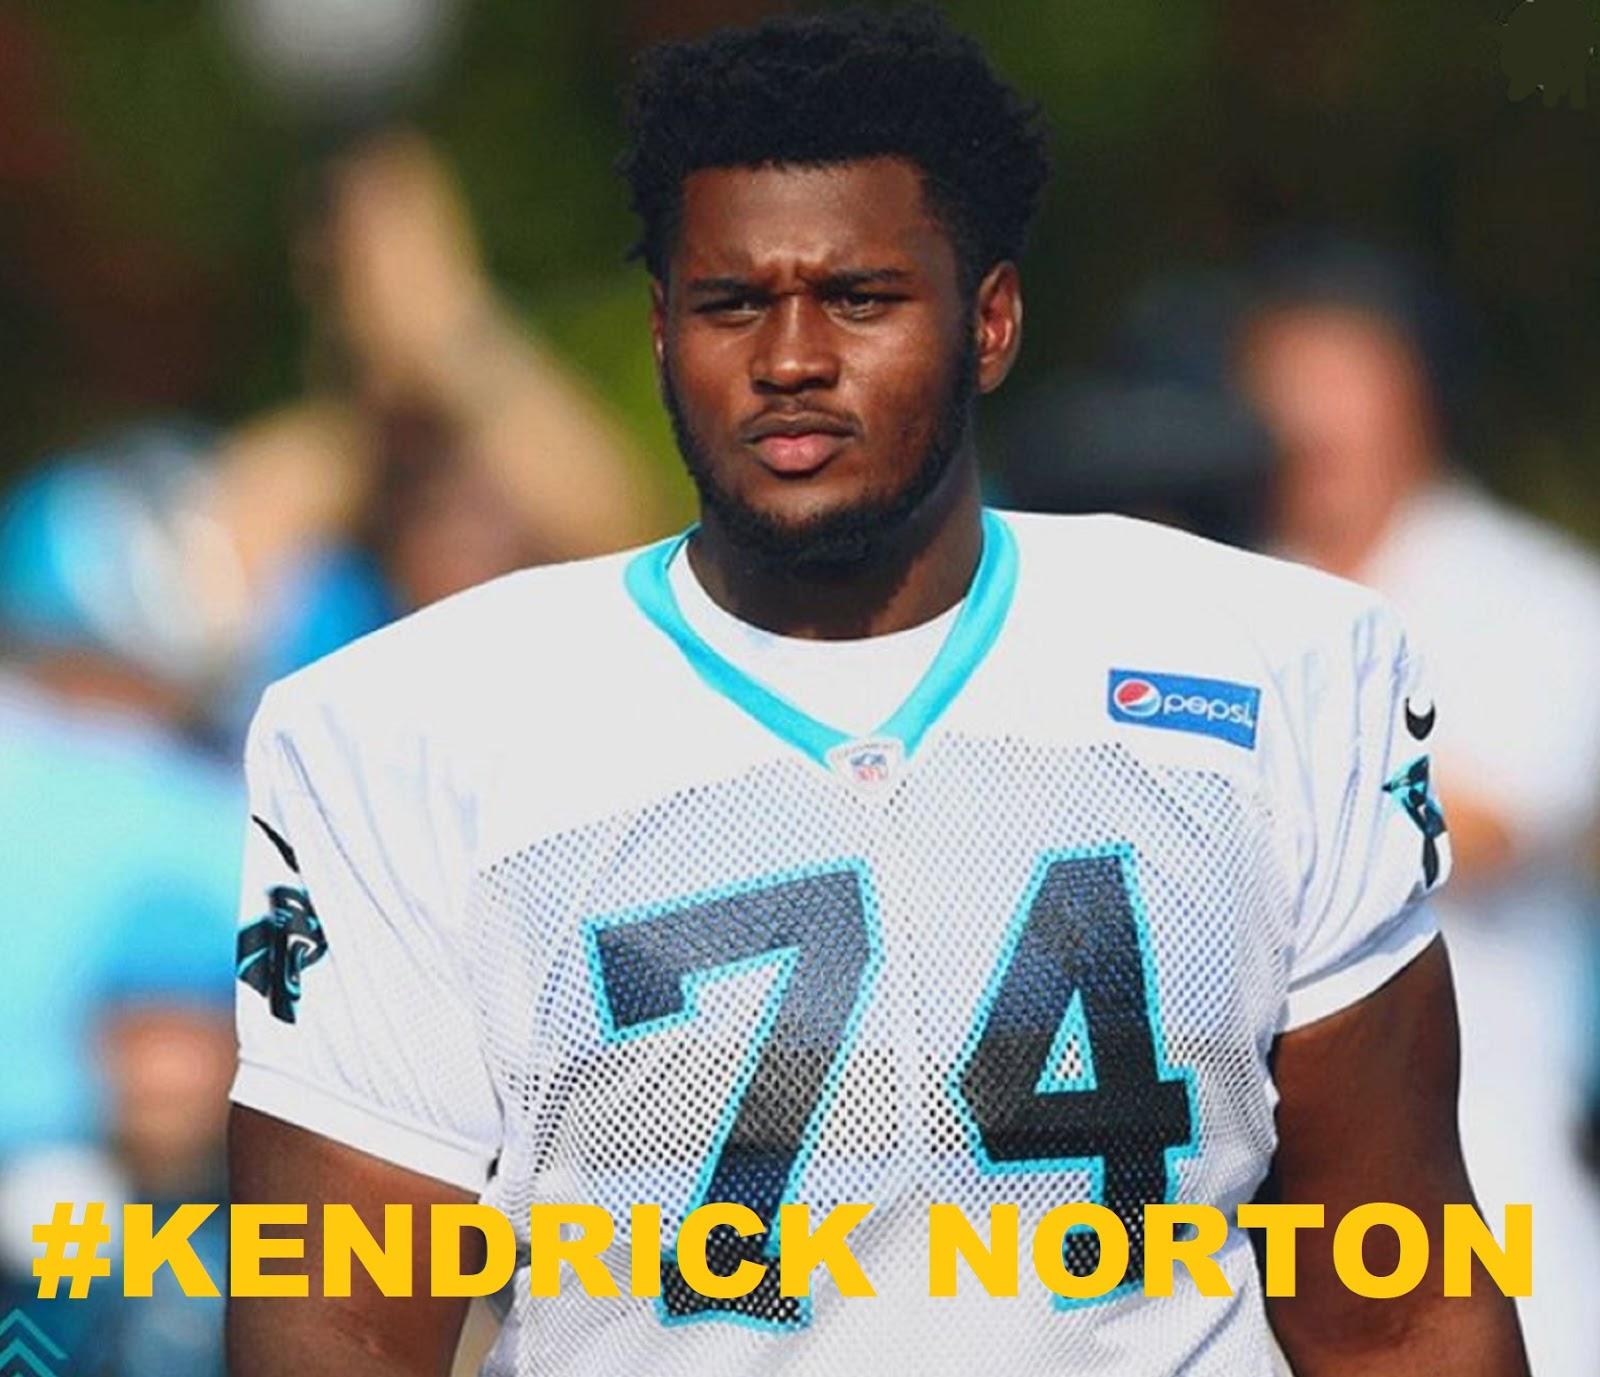 KENDRICK NORTON 2